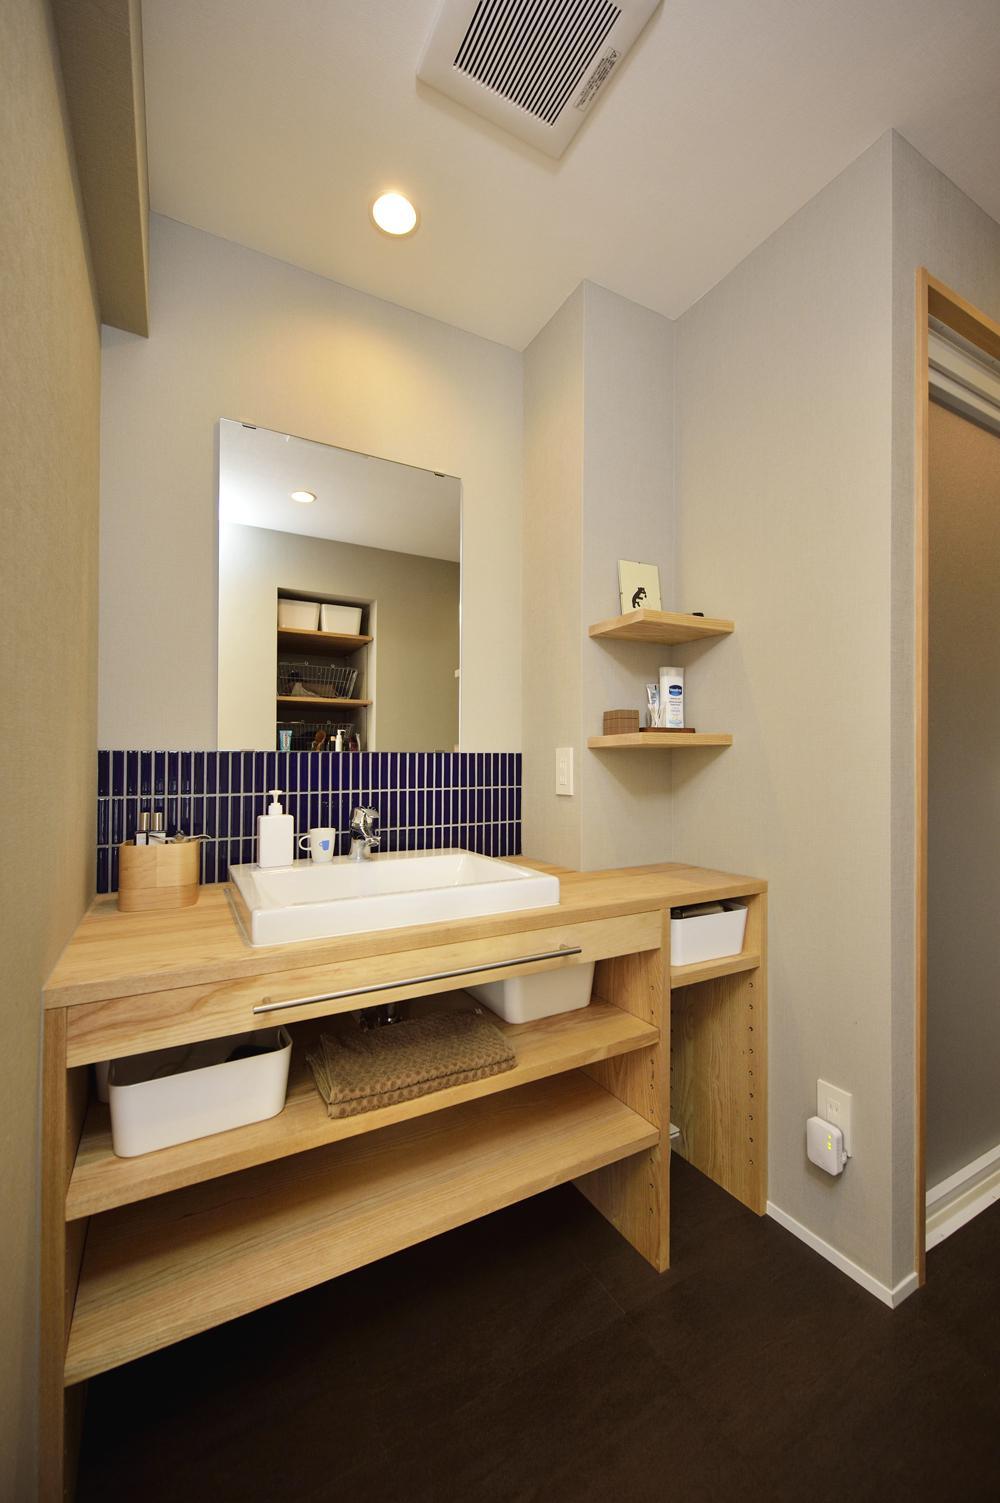 K邸・暮しを彩る収納のある家の部屋 ブルータイルがアクセントの洗面室